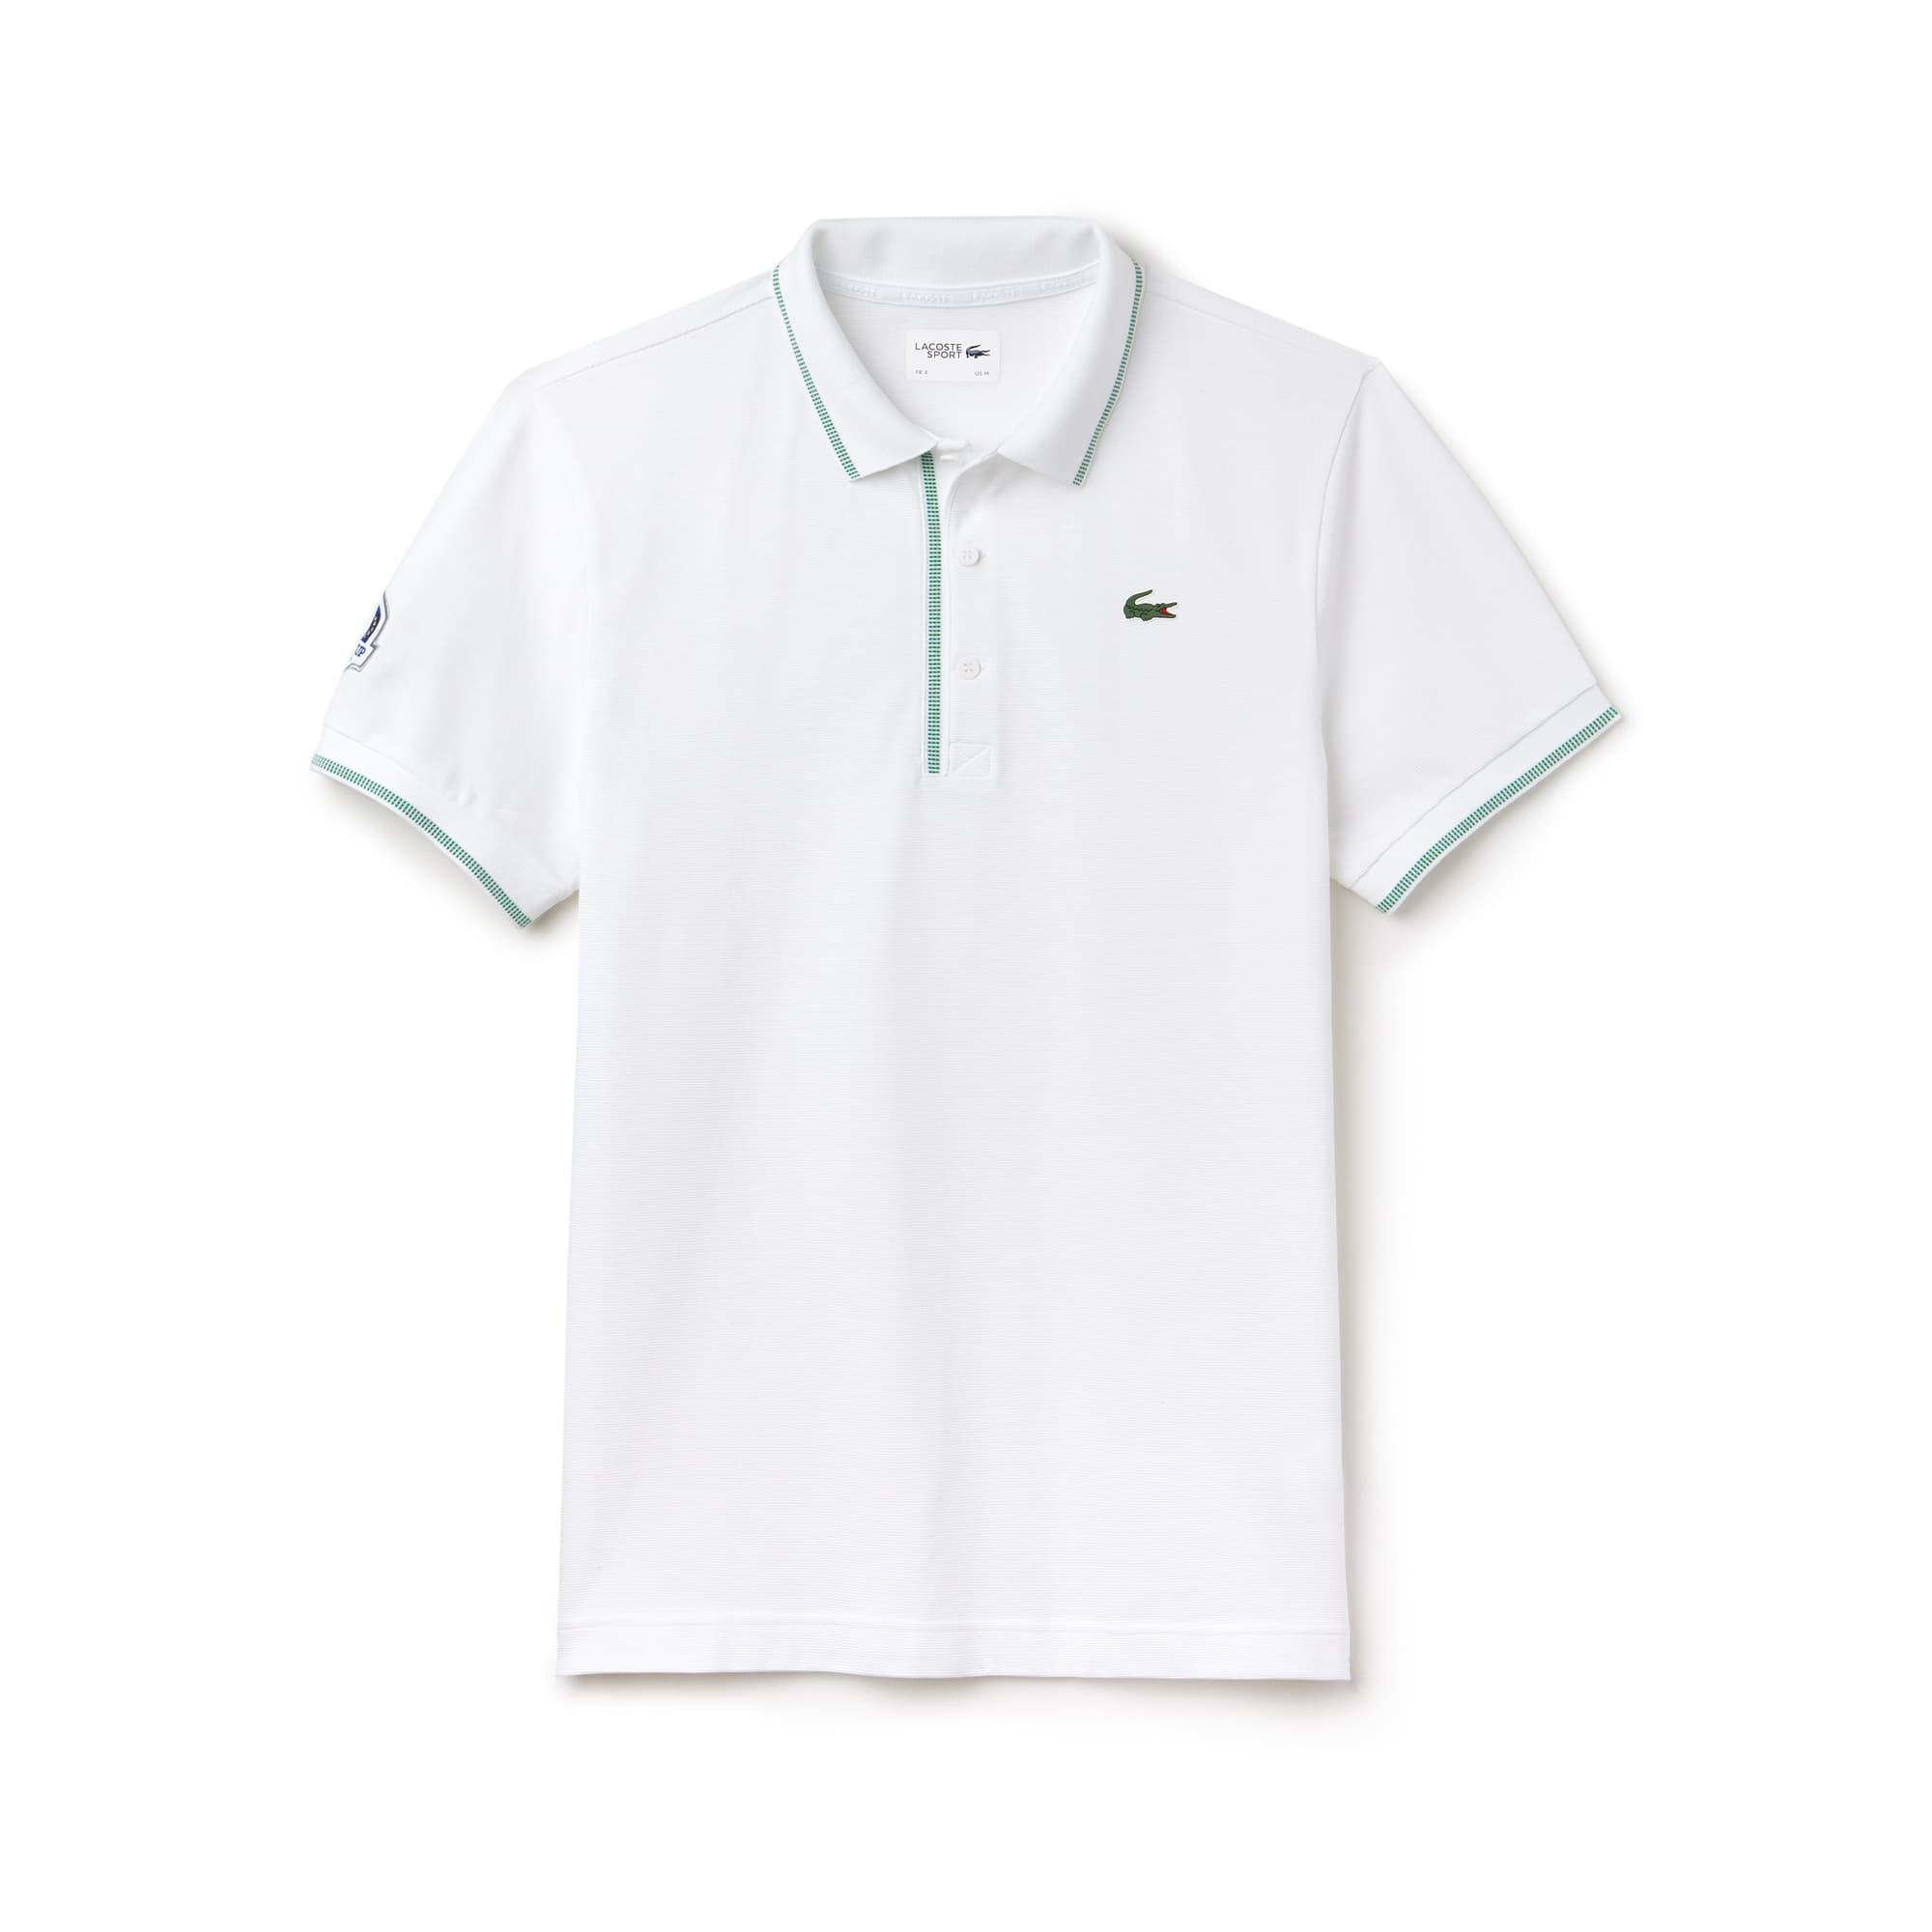 Herren LACOSTE SPORT Ryder Cup Edition Golf Poloshirt mit Paspeln